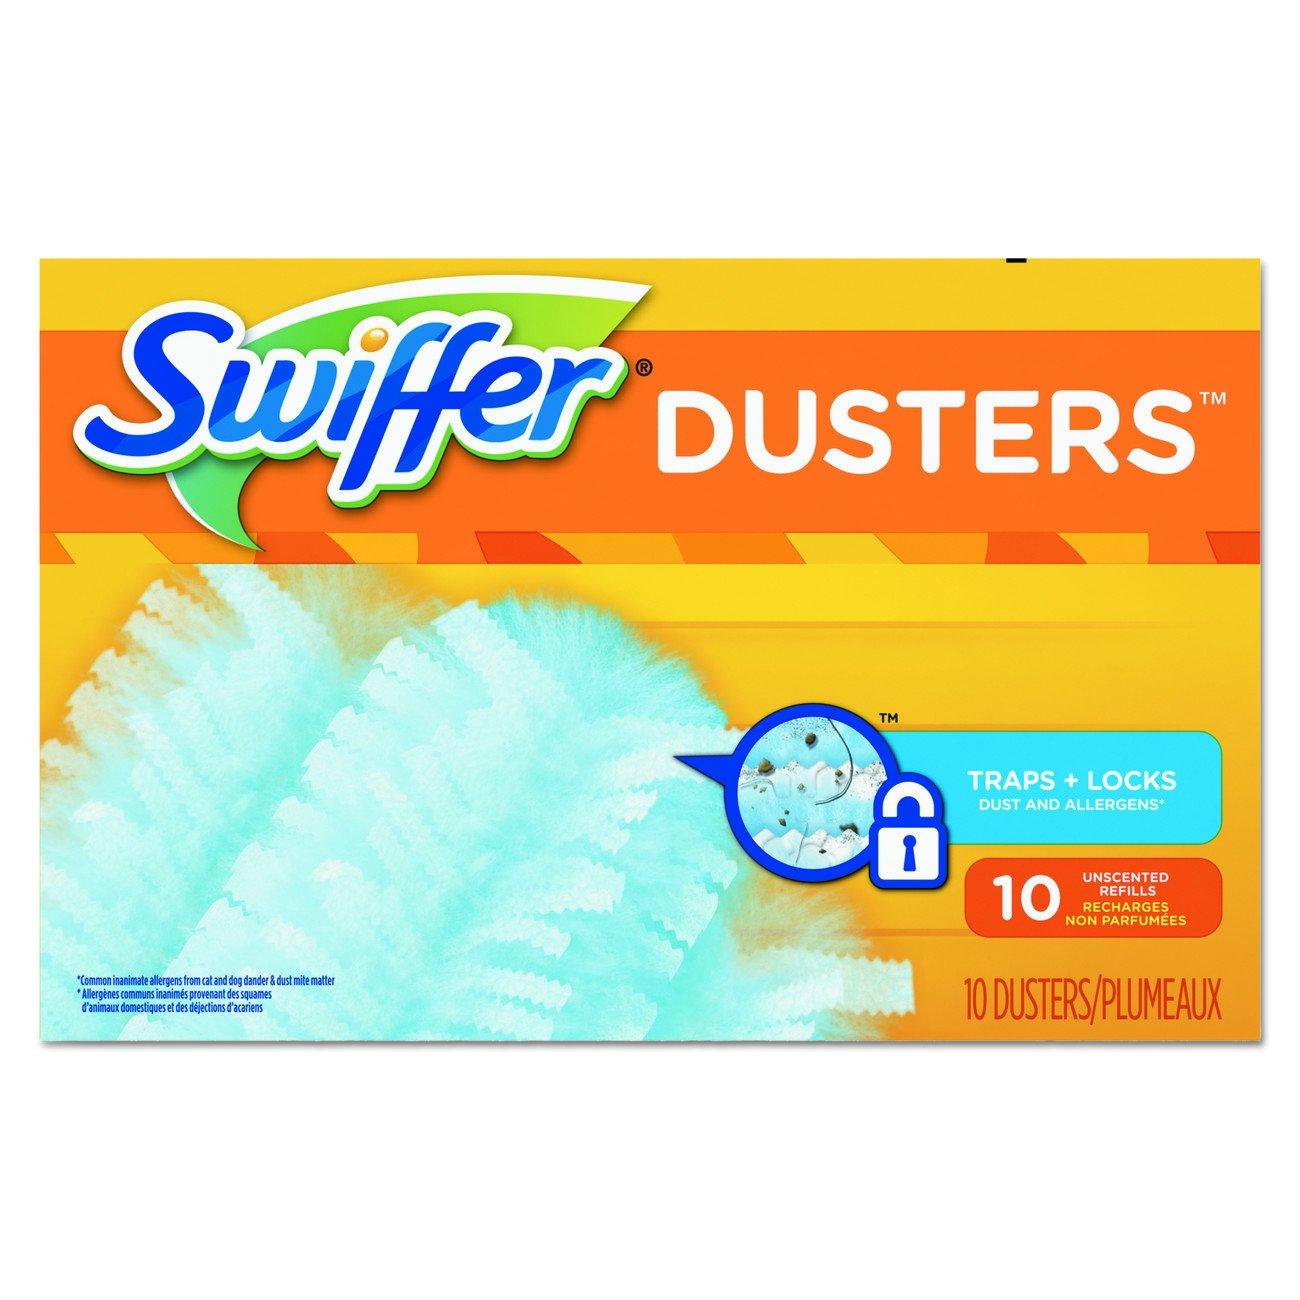 Swiffer PGC 21459CT 21459 Refill Duster, Dust Lock Fiber, Unscented, Light Blue (Pack of 40)